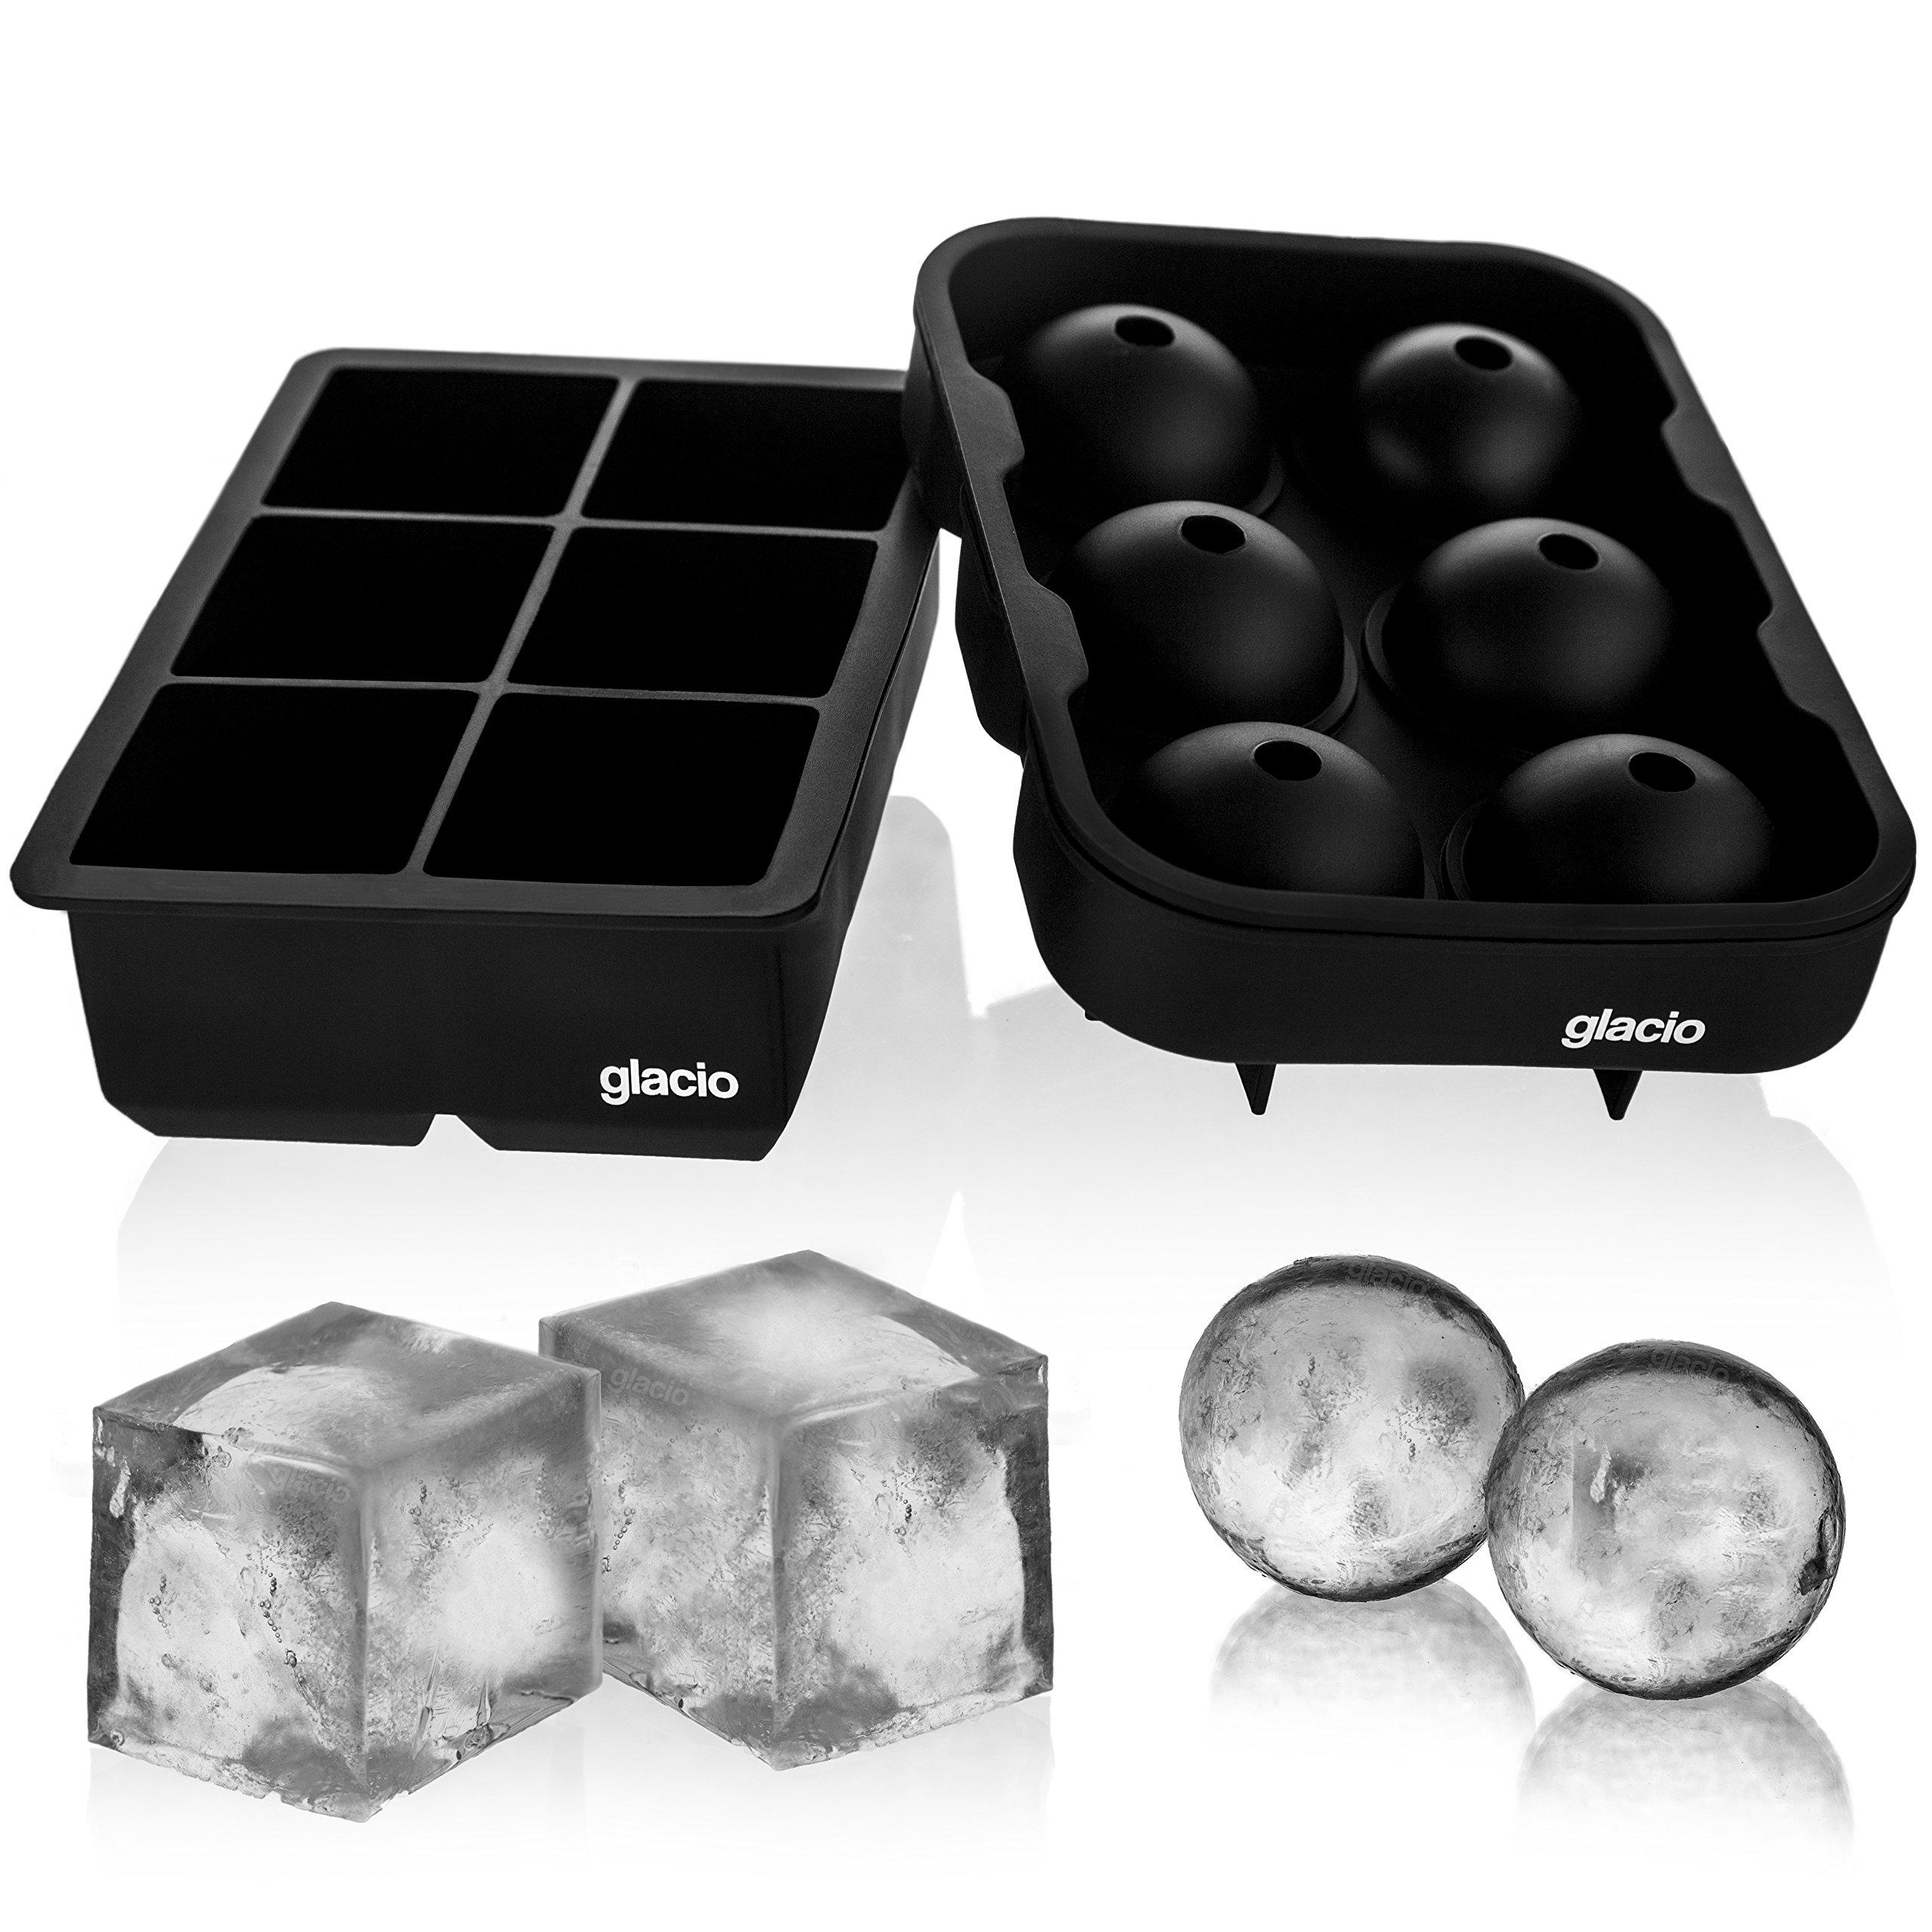 Glacio Ice Cube Trays Silicone Combo Mold Set Of 2